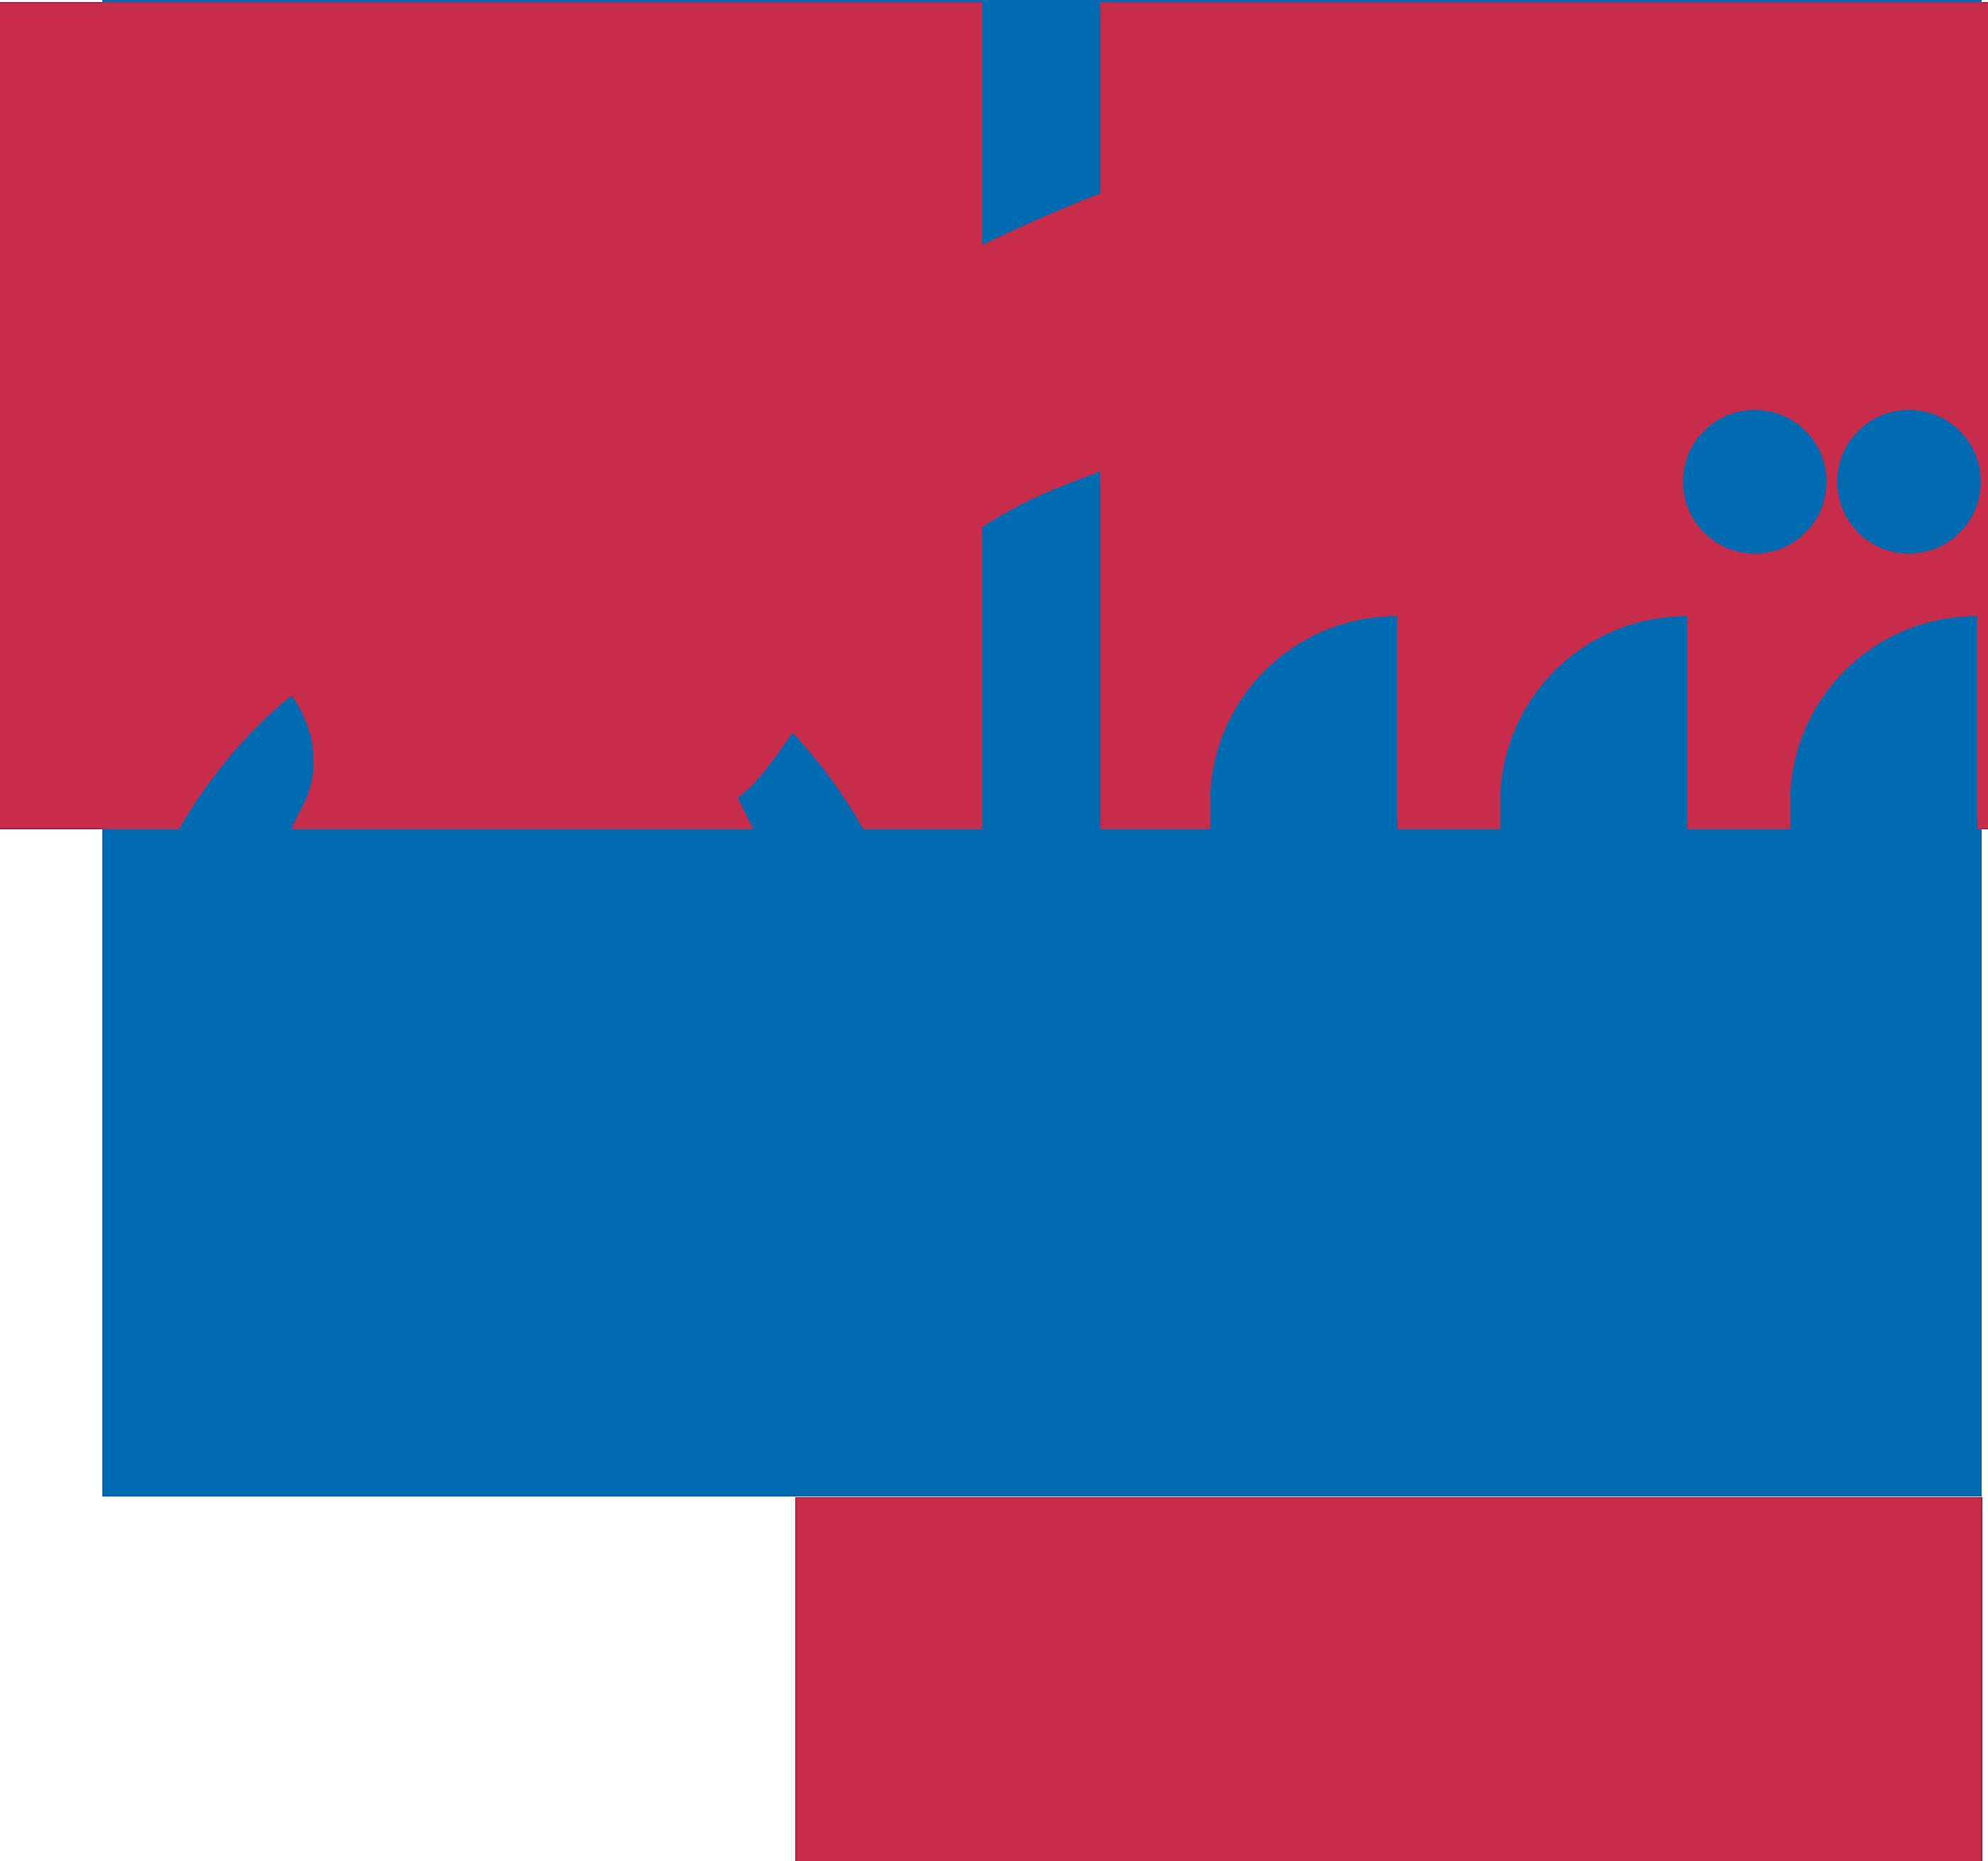 Tebyan Education Services Qatar